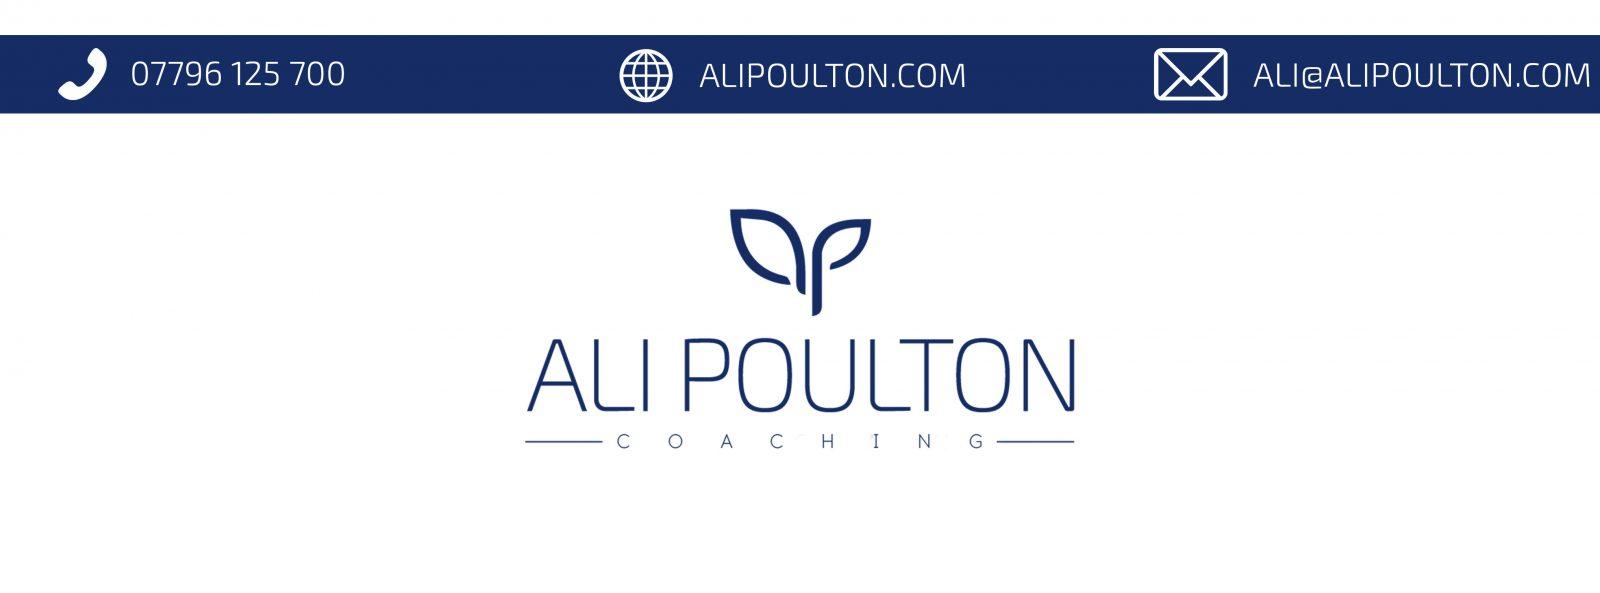 alipoulton